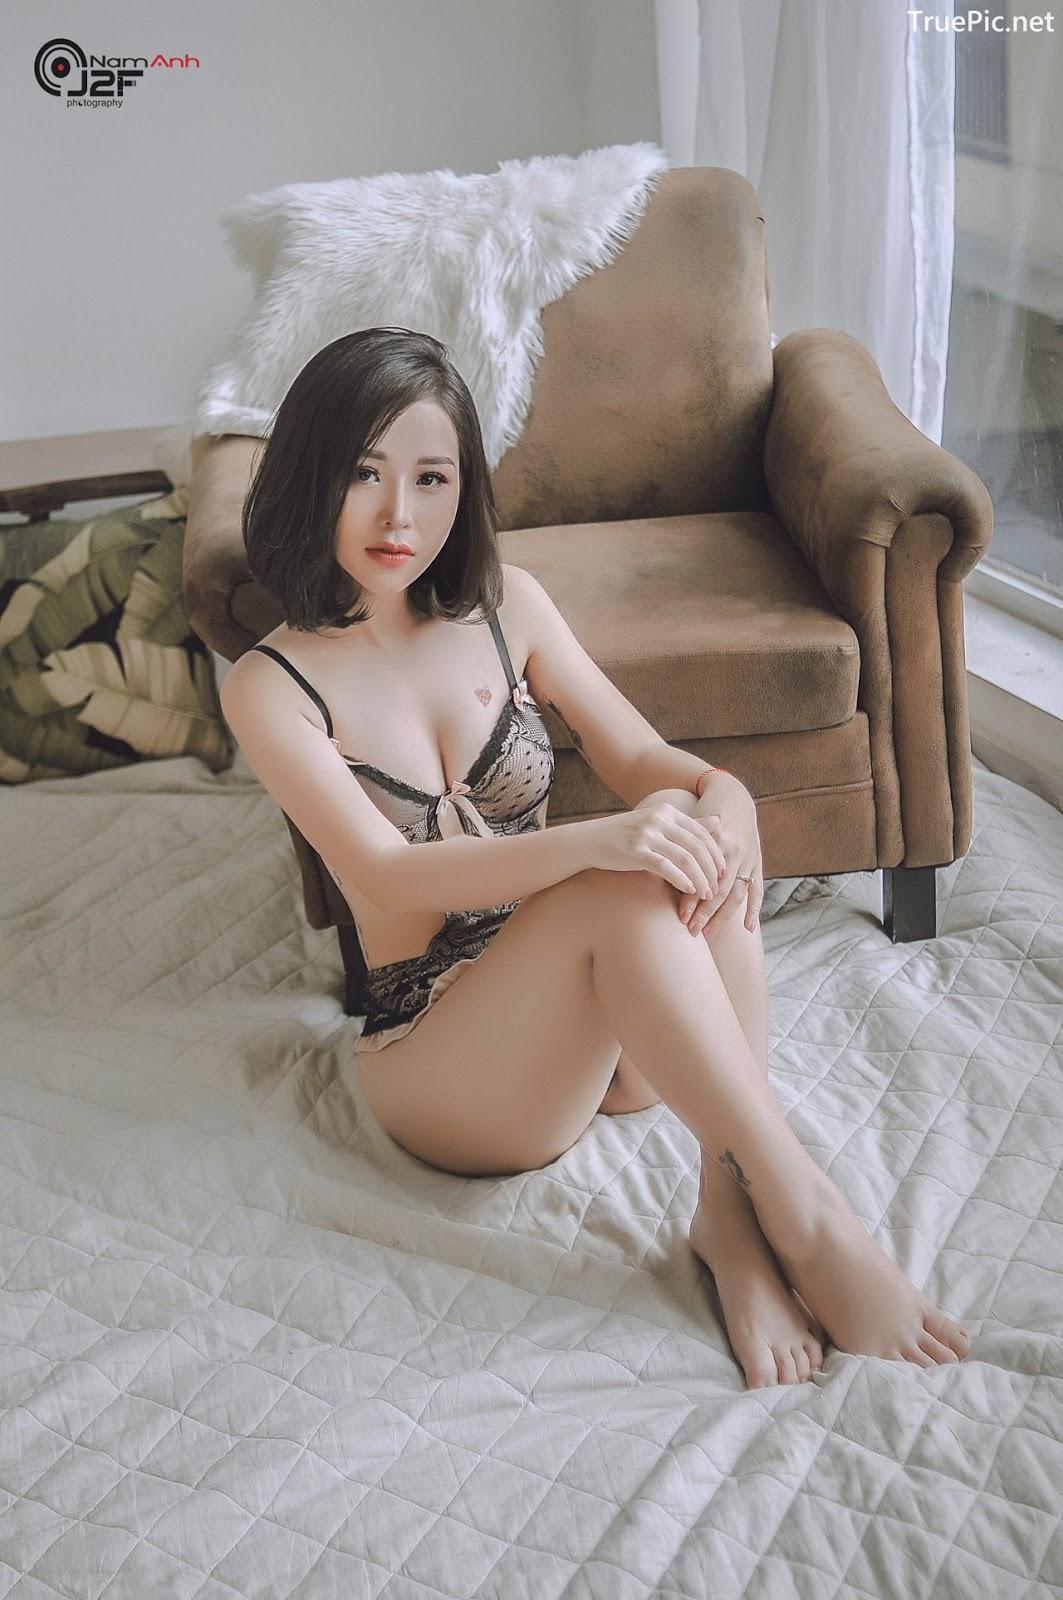 Image Vietnamese Model – Sexy Beauty of Beautiful Girls Taken by NamAnh Photo #6 - TruePic.net - Picture-5